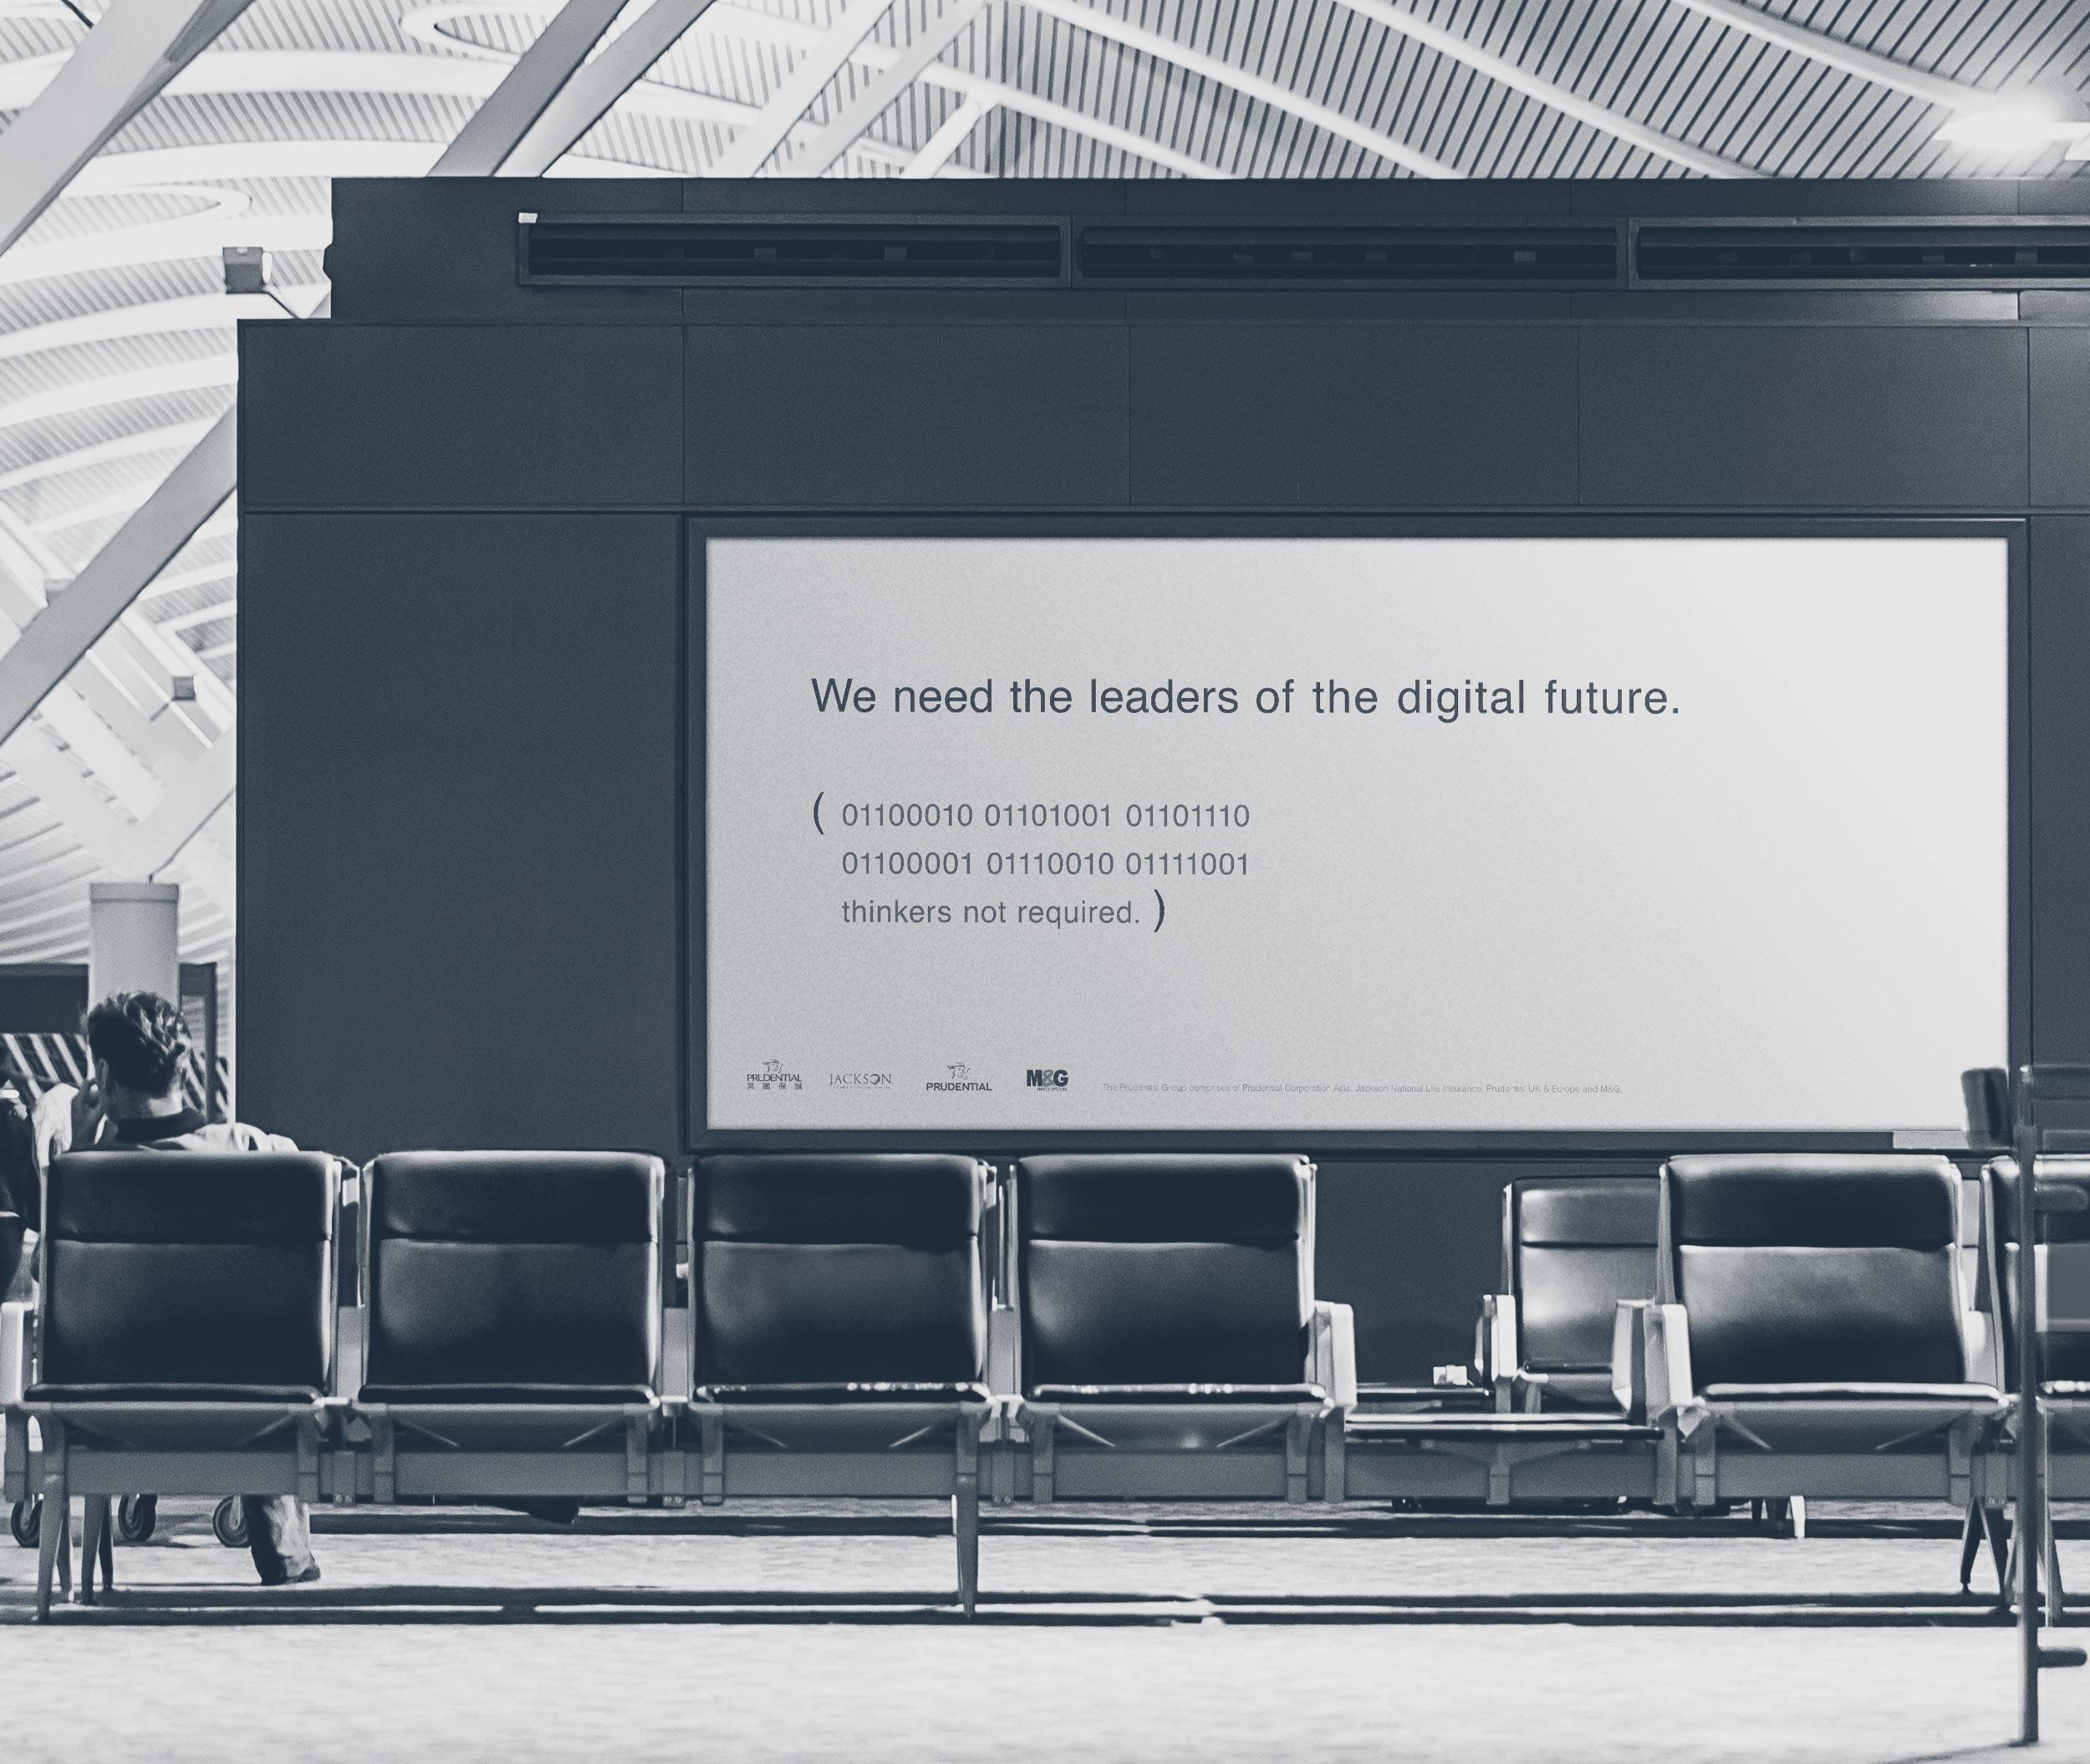 Prudential Next Generation airport billboard advertisement